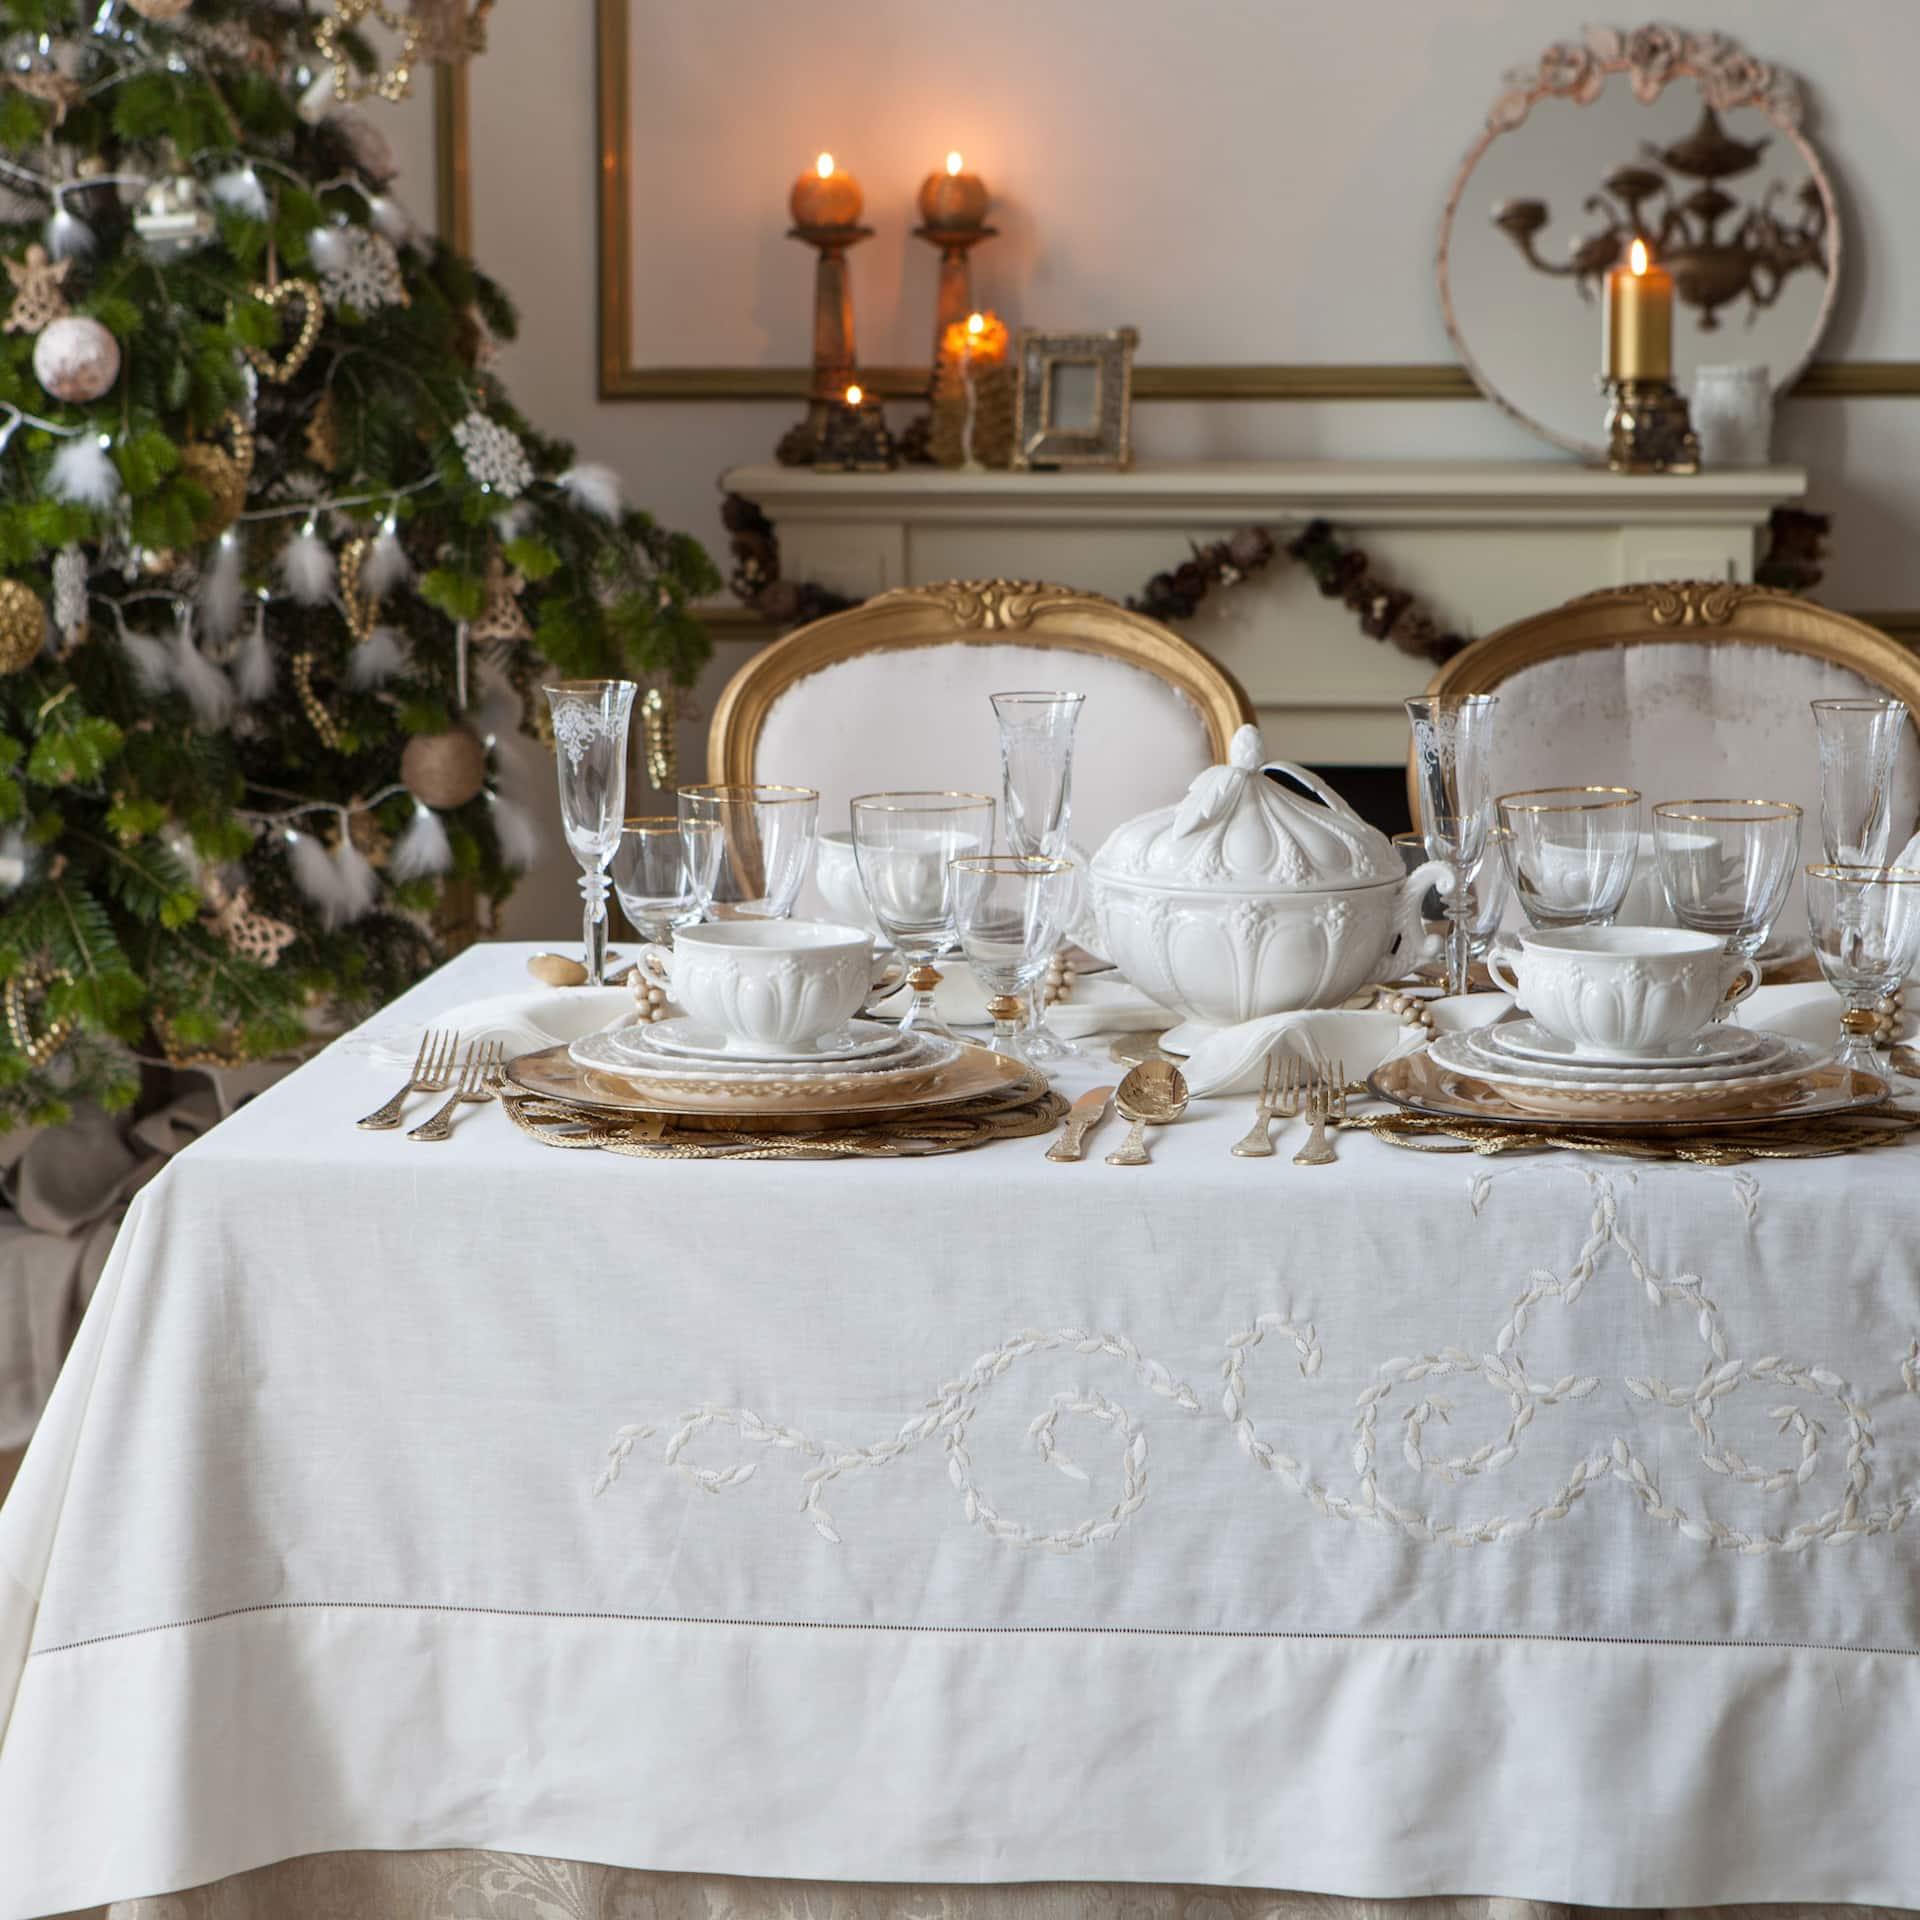 Zara Home 2014 | Zara home, White decor, Table decorations